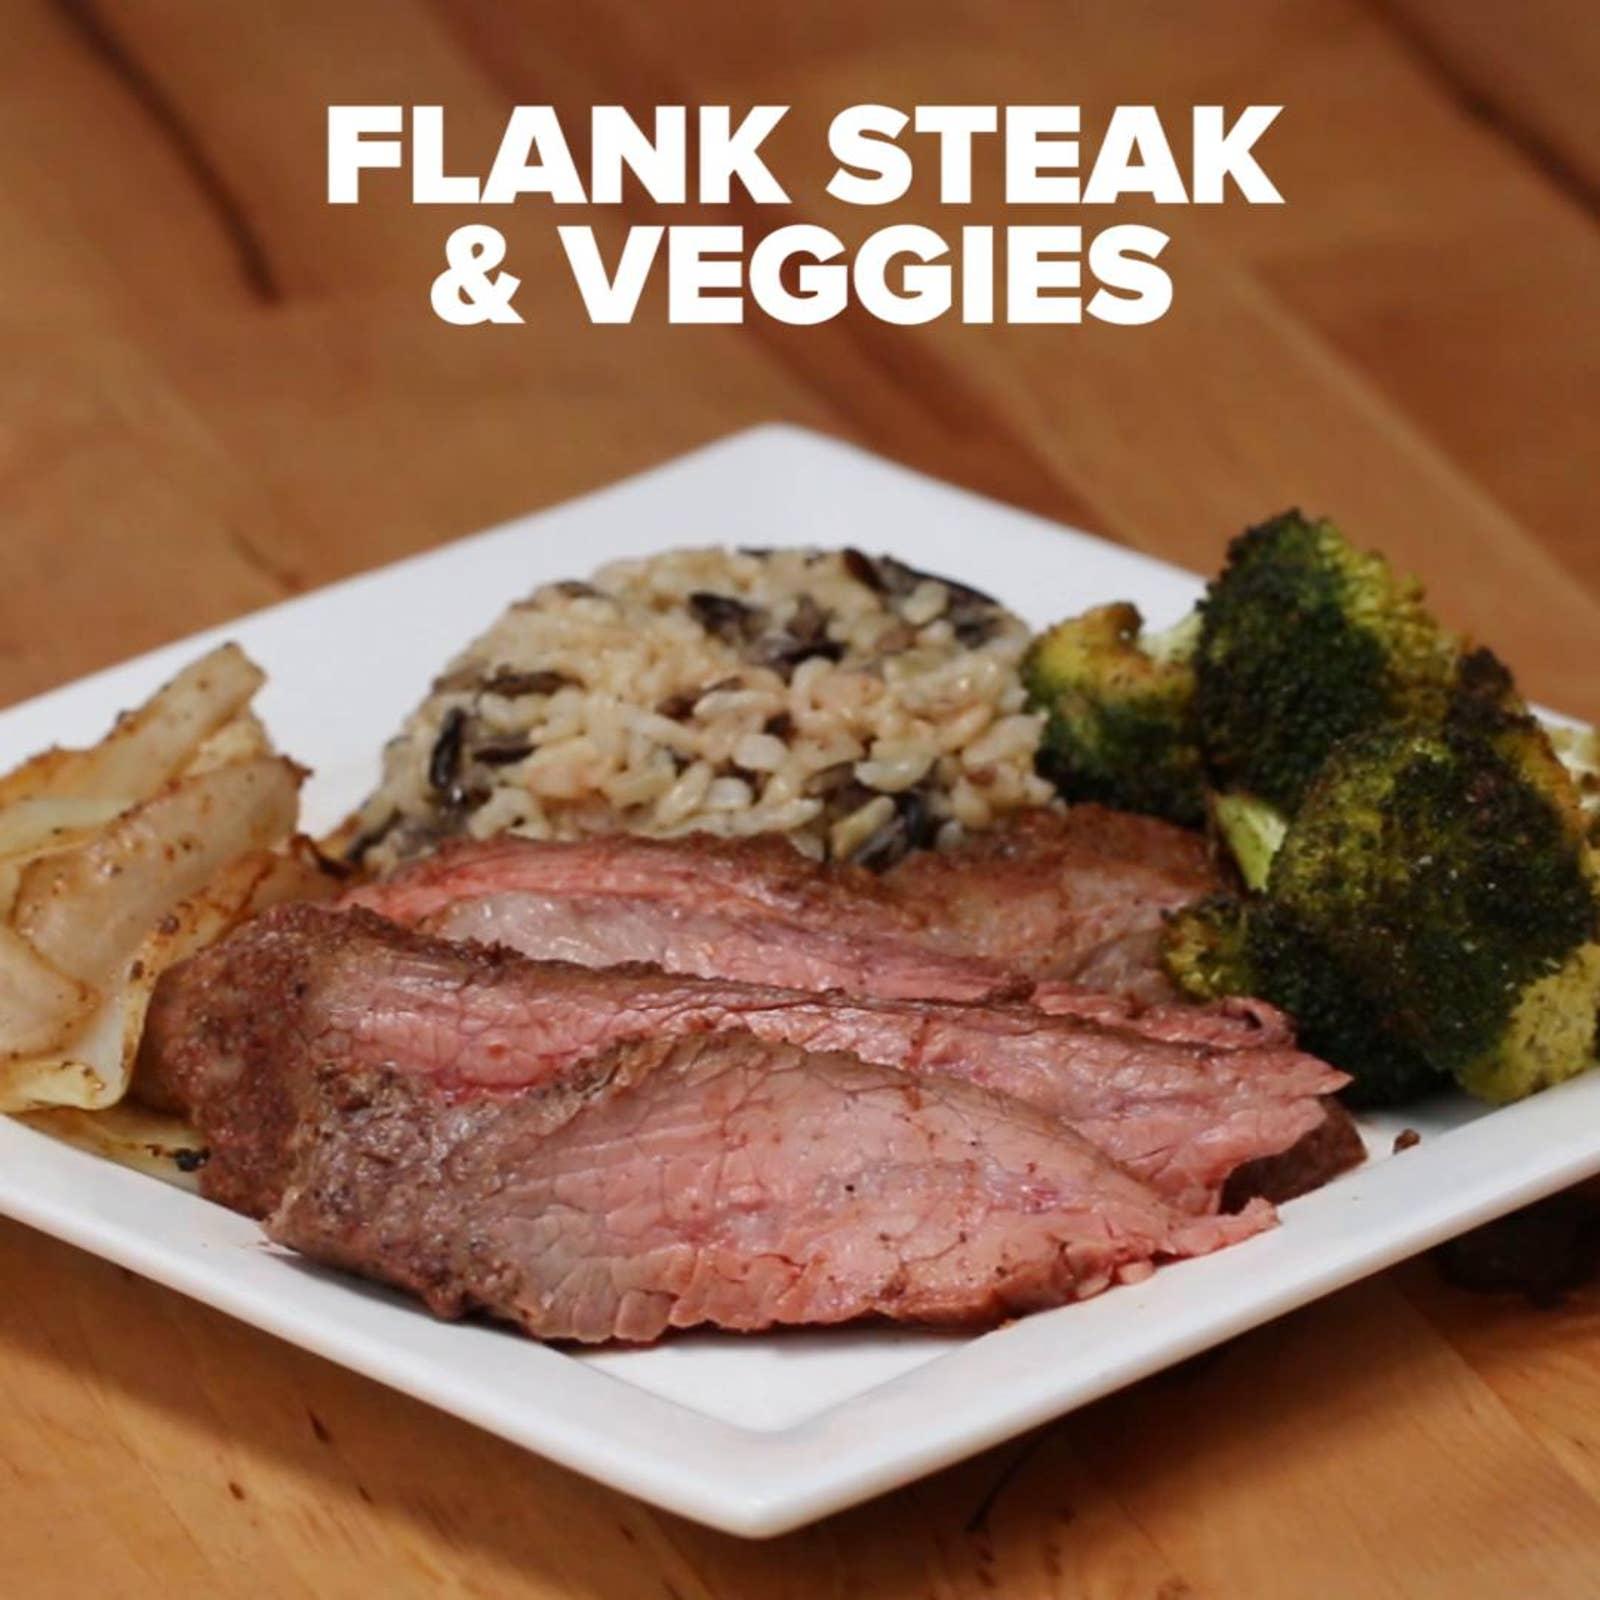 One-pan Flank Steak & Veggies